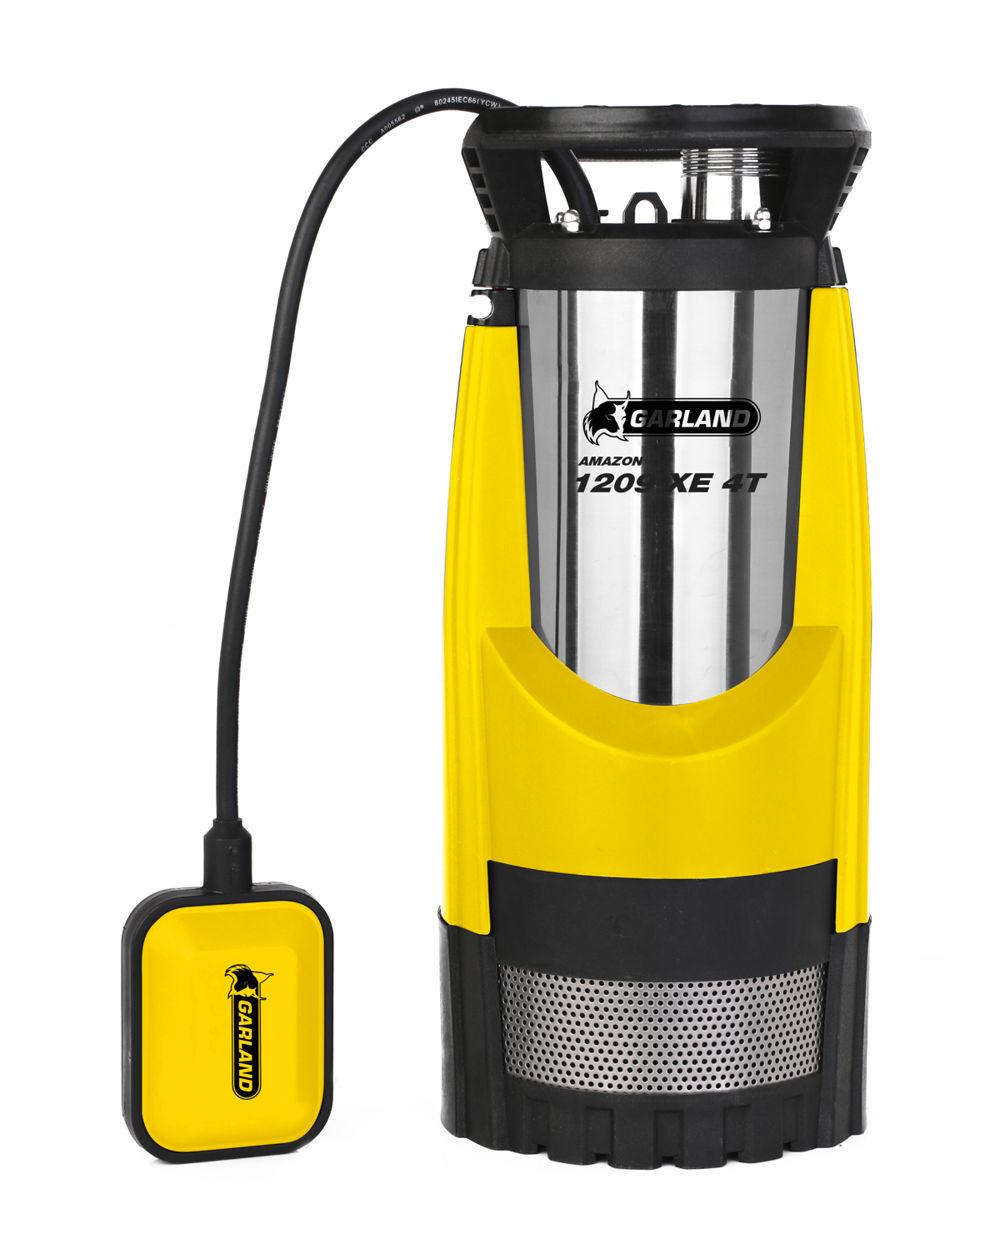 Bomba sumergible para aguas limpias Garland AMAZON 1209 XE4T